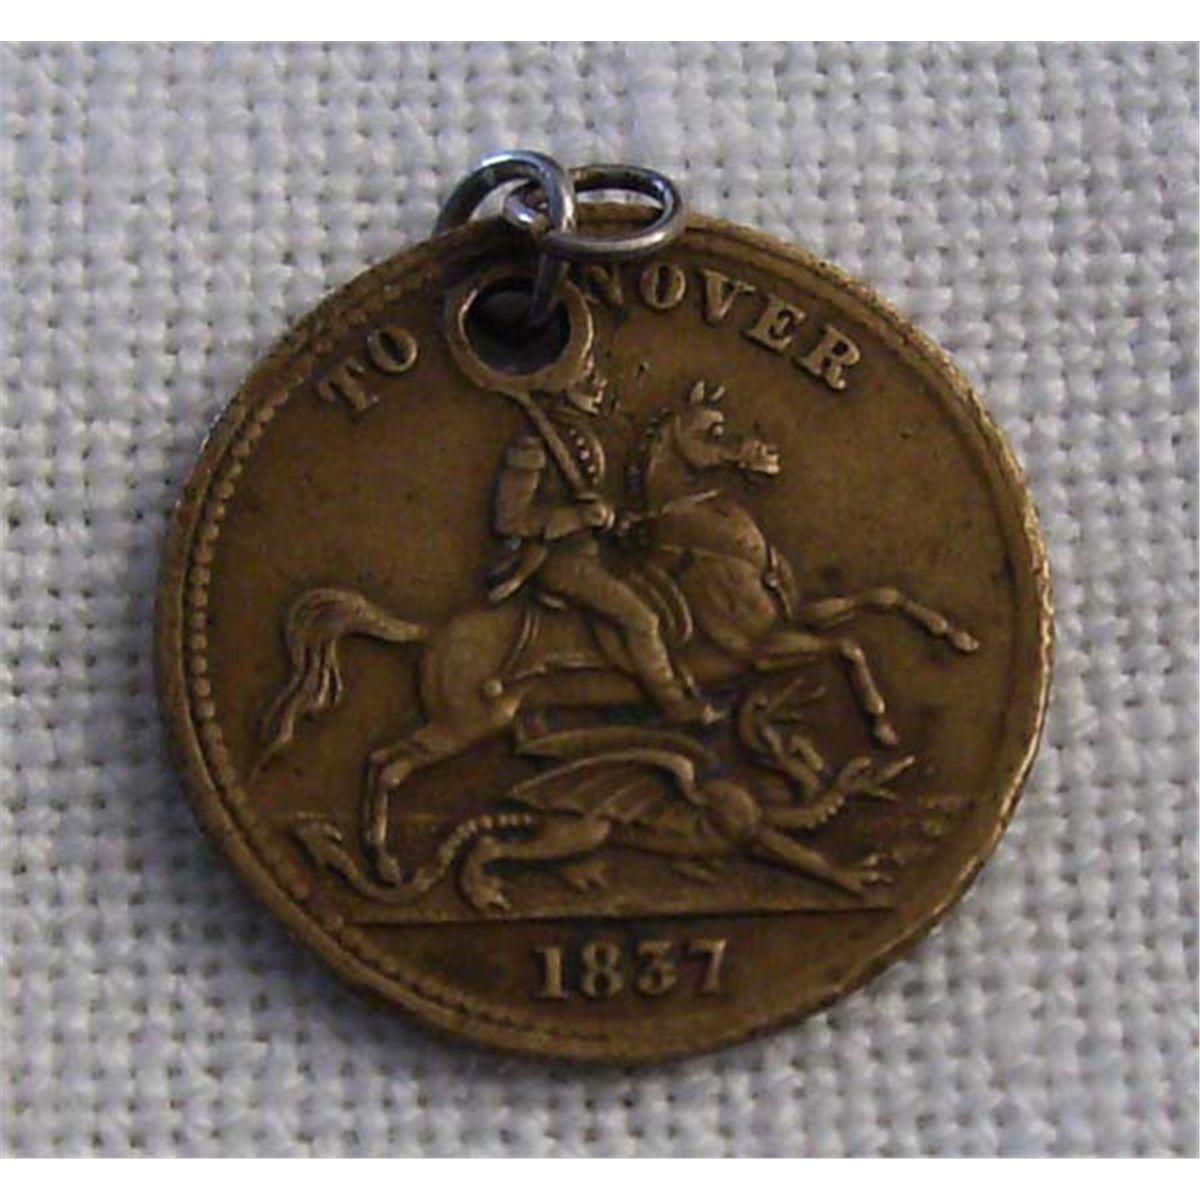 1837 victoria coin